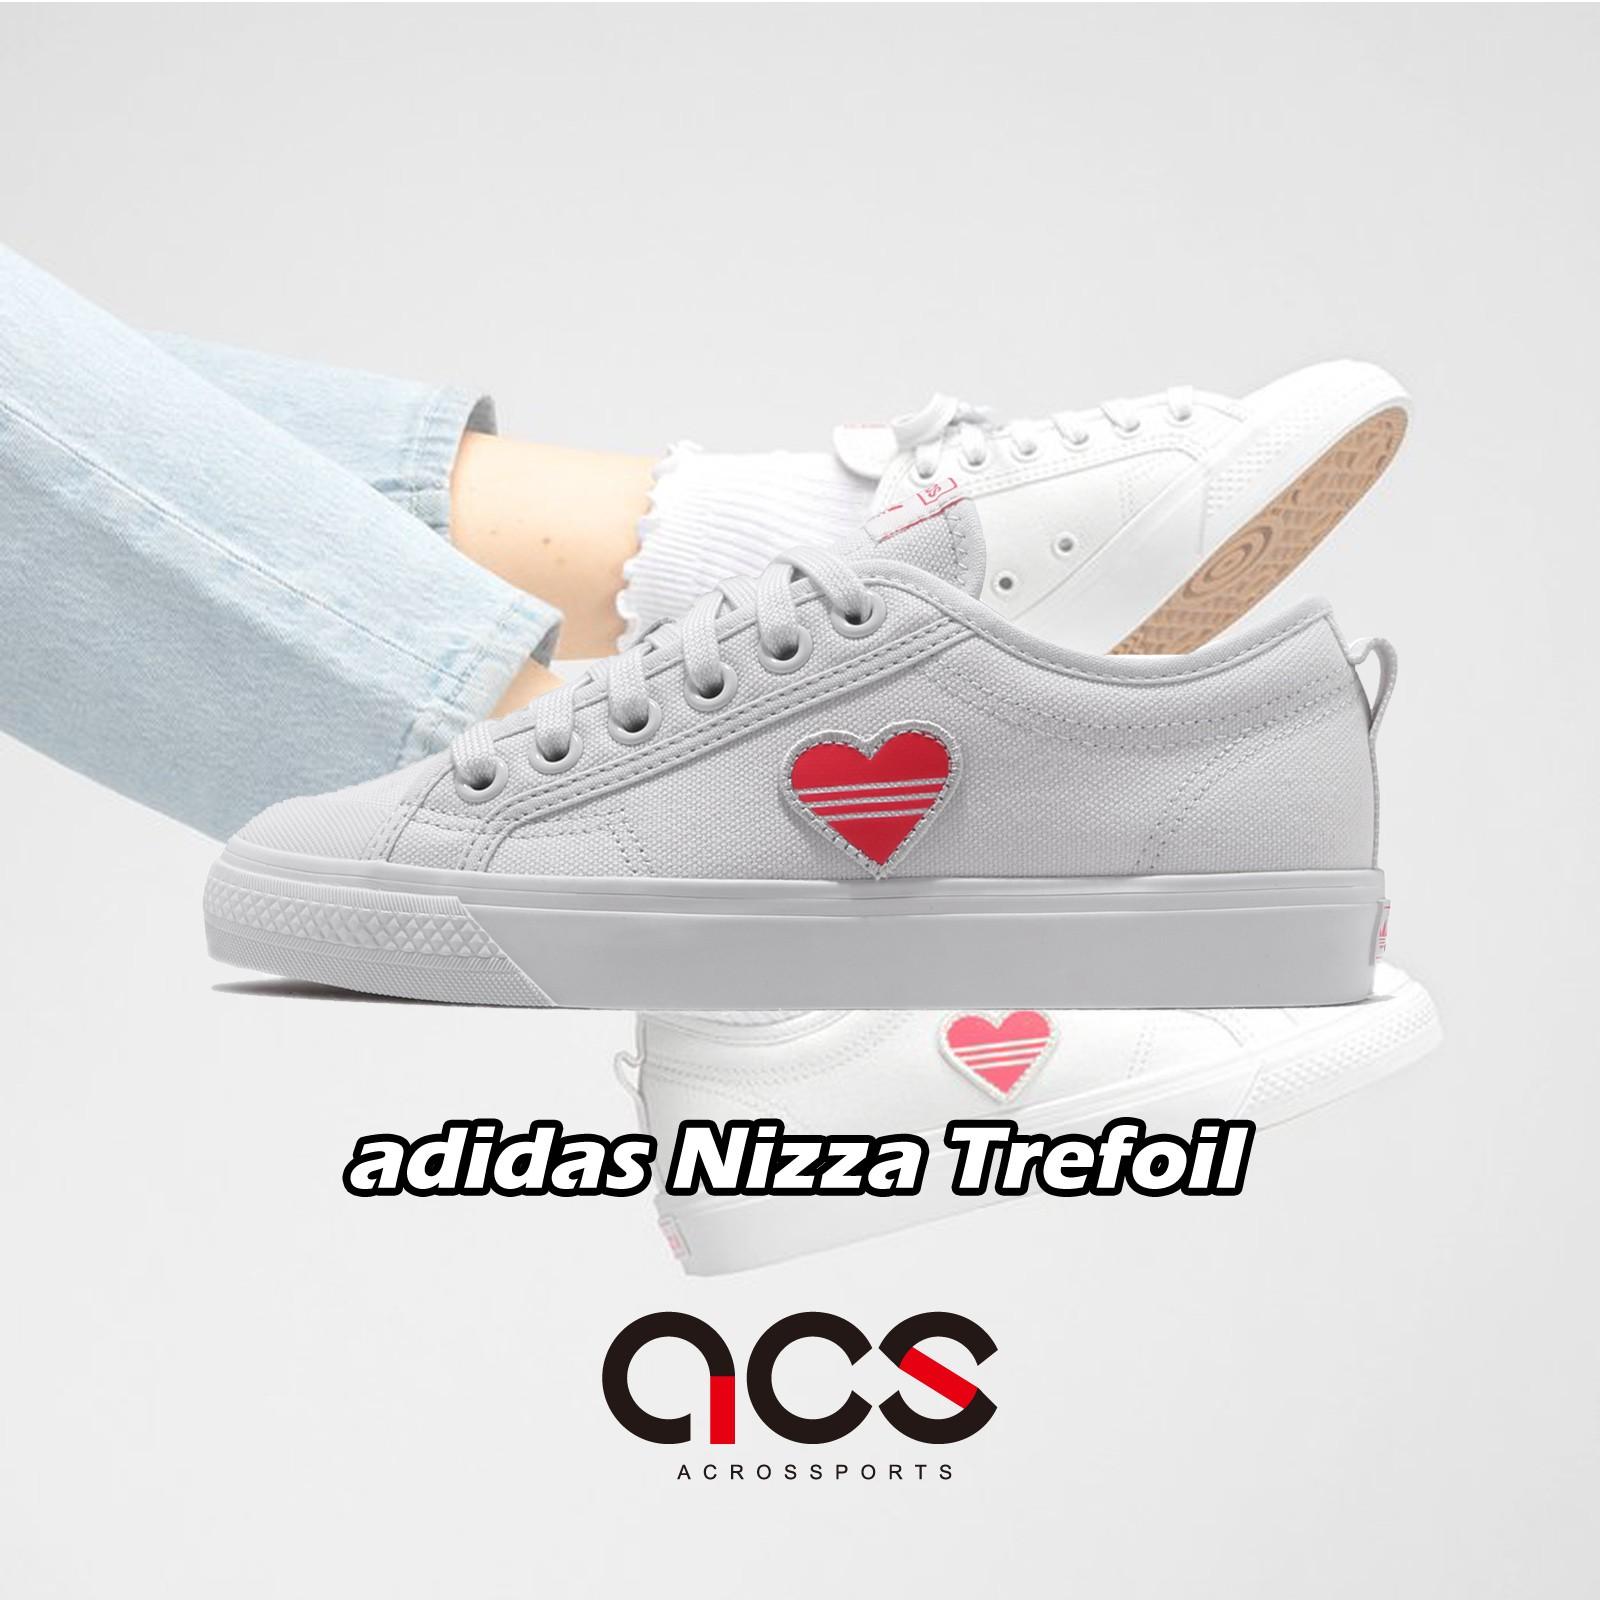 adidas 休閒鞋 Nizza Trefoil W 白 紅 愛心 情人節 女鞋 EF5074 【ACS】